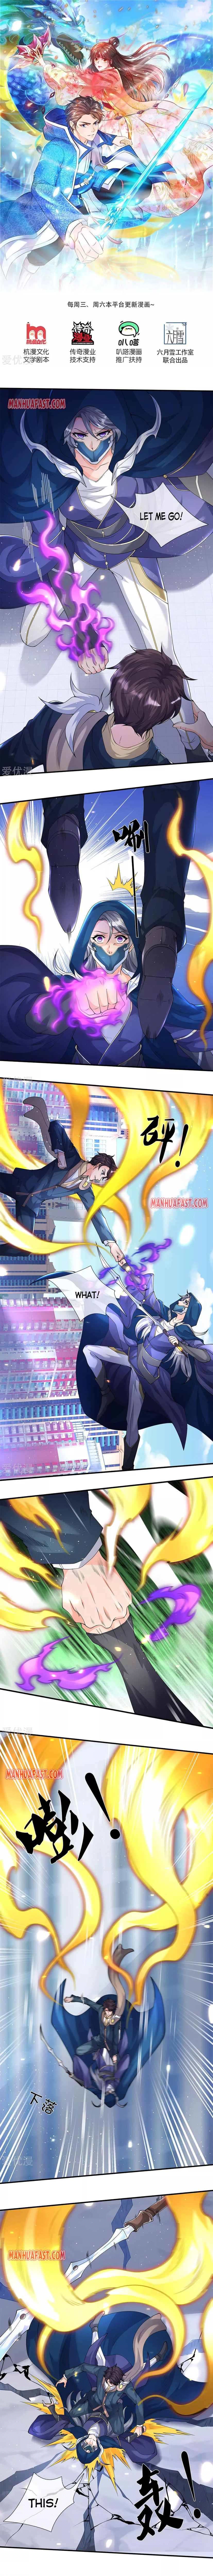 https://manga.mangadogs.com/comics/pic4/39/32615/2986222/f77353ba8b5743c5523a5f5578873c9f.jpg Page 1